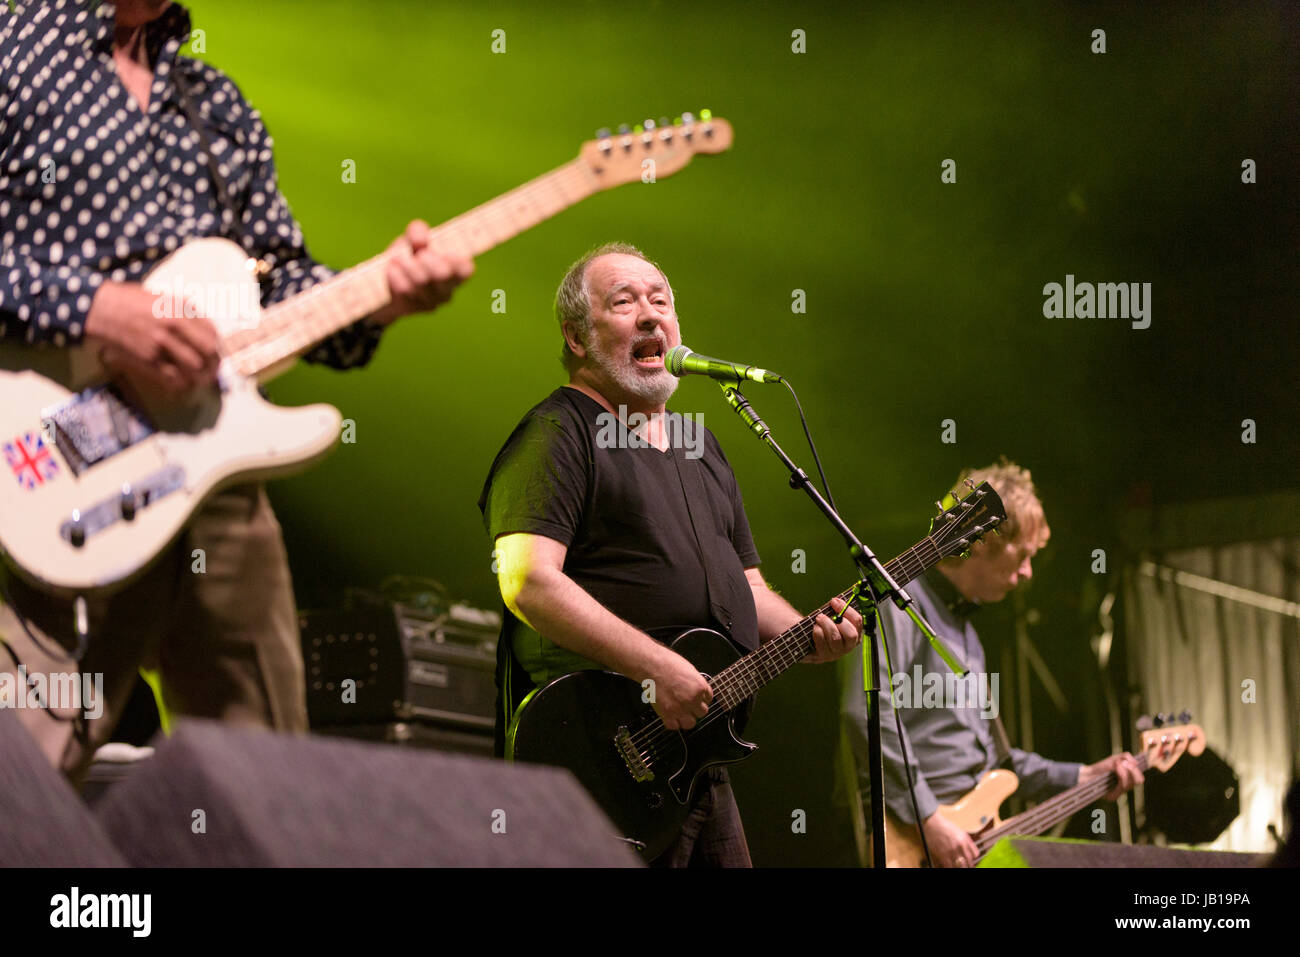 The Buzzcocks (Pete Shelley) perform at Wychwood Festival, Cheltenham, UK - Stock Image